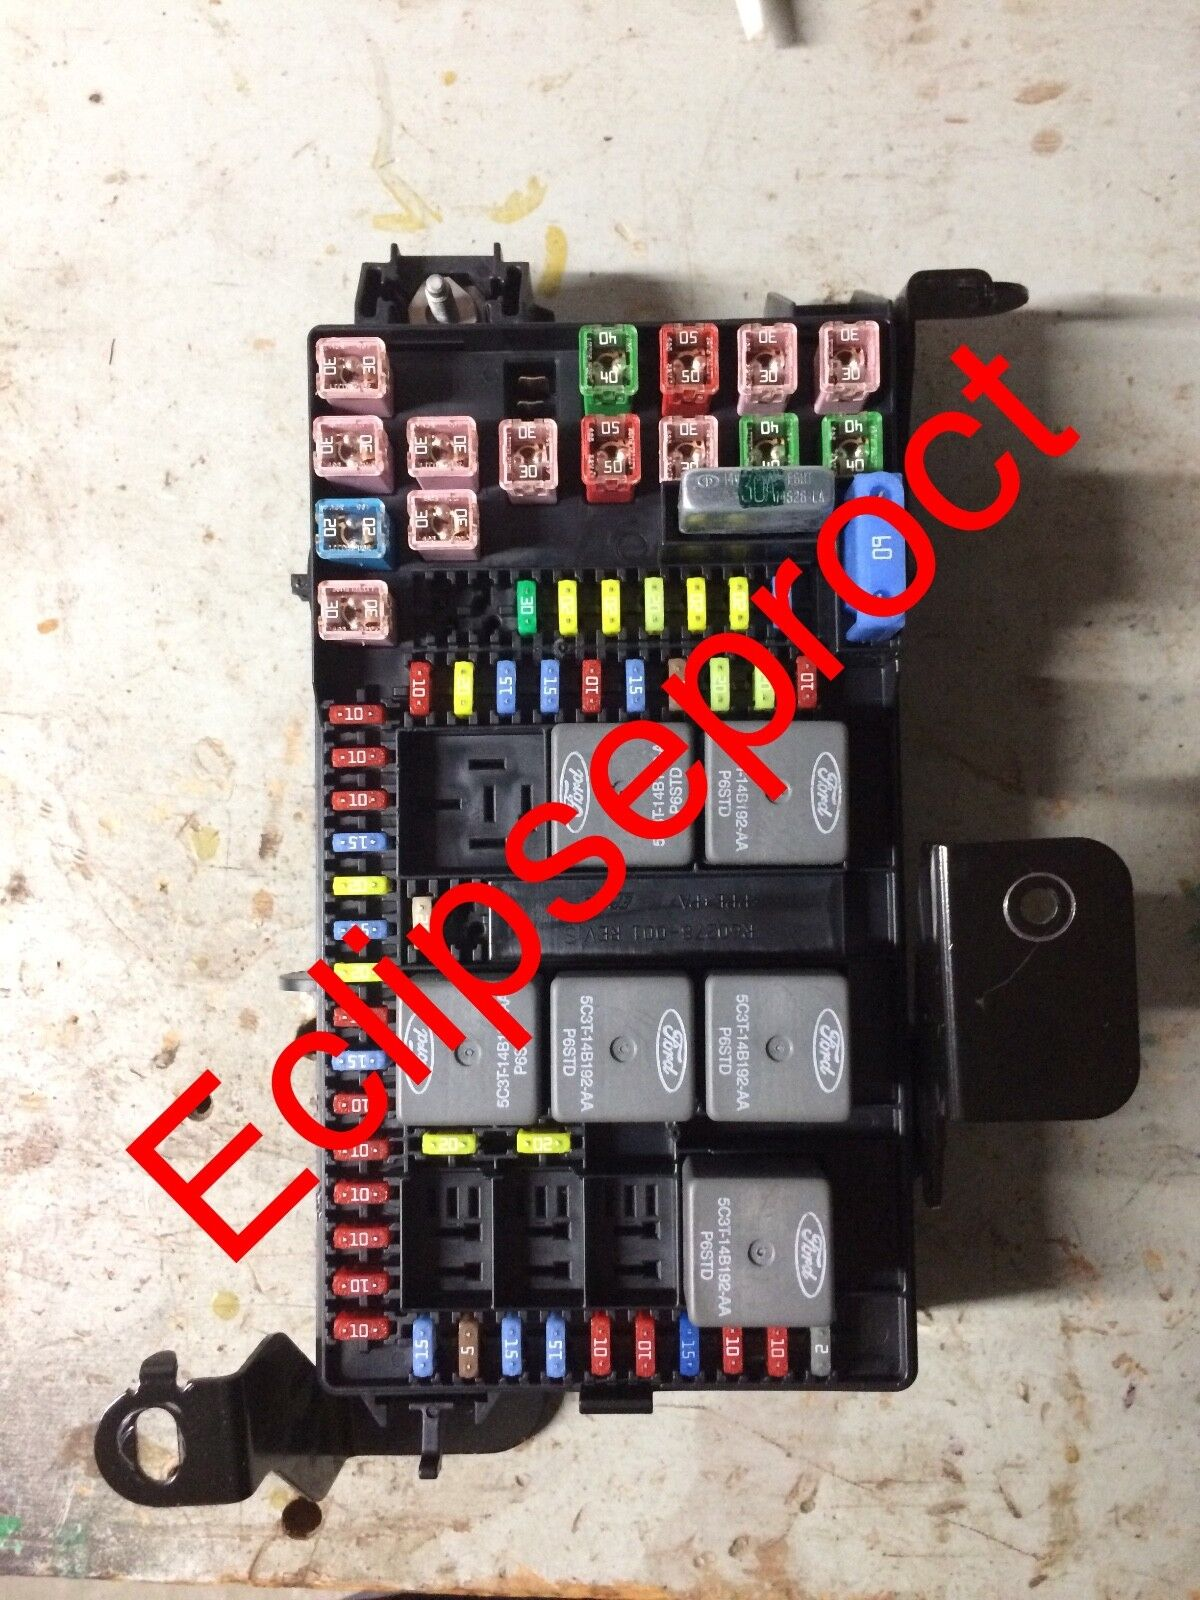 2002-2003 Ford Excursion Fuse Box Repair Service